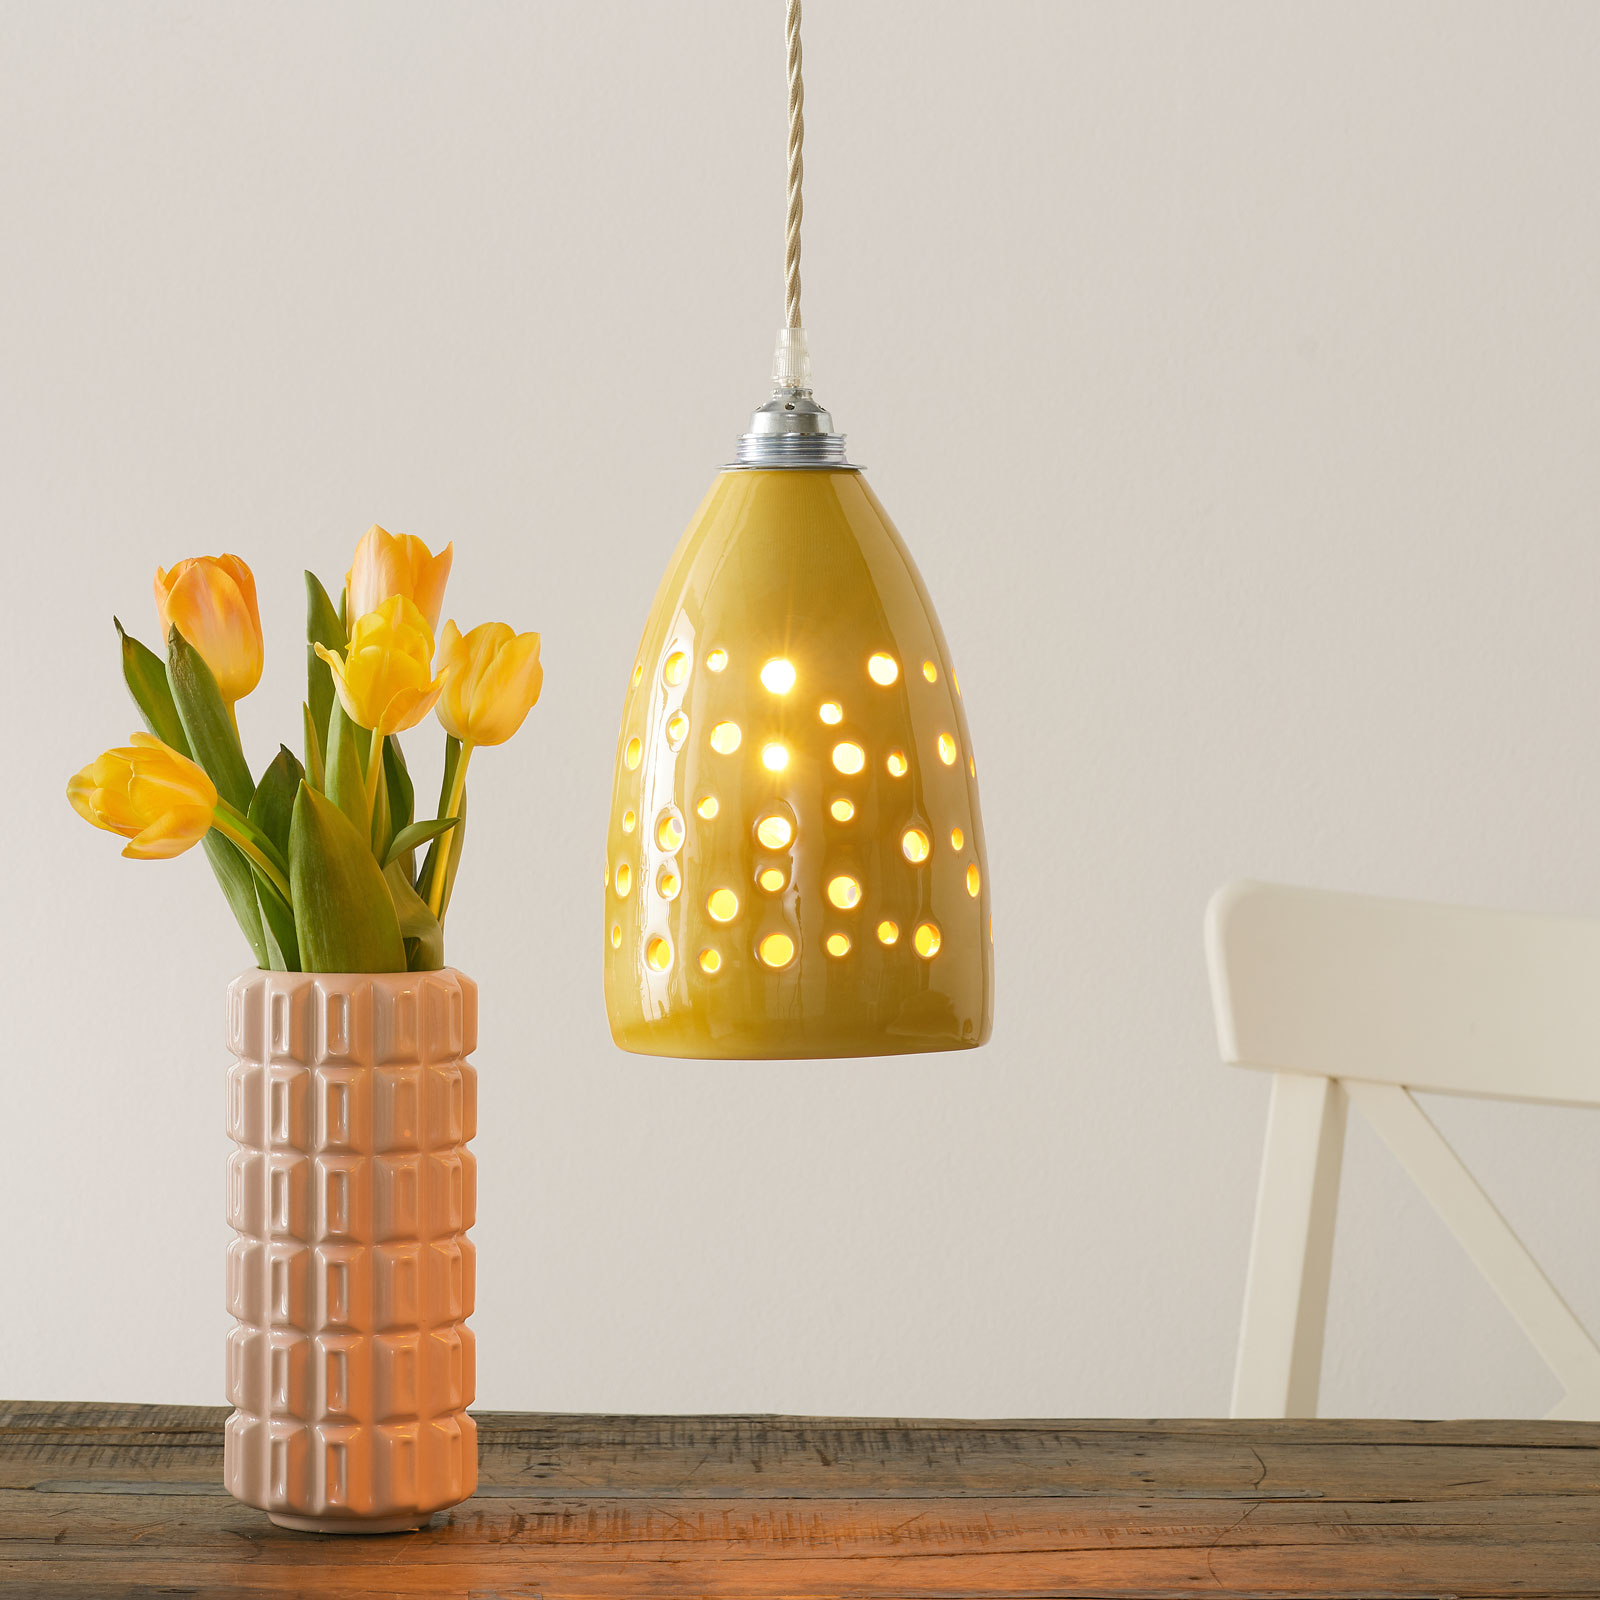 Keramiek-hanglamp S1815 in geel